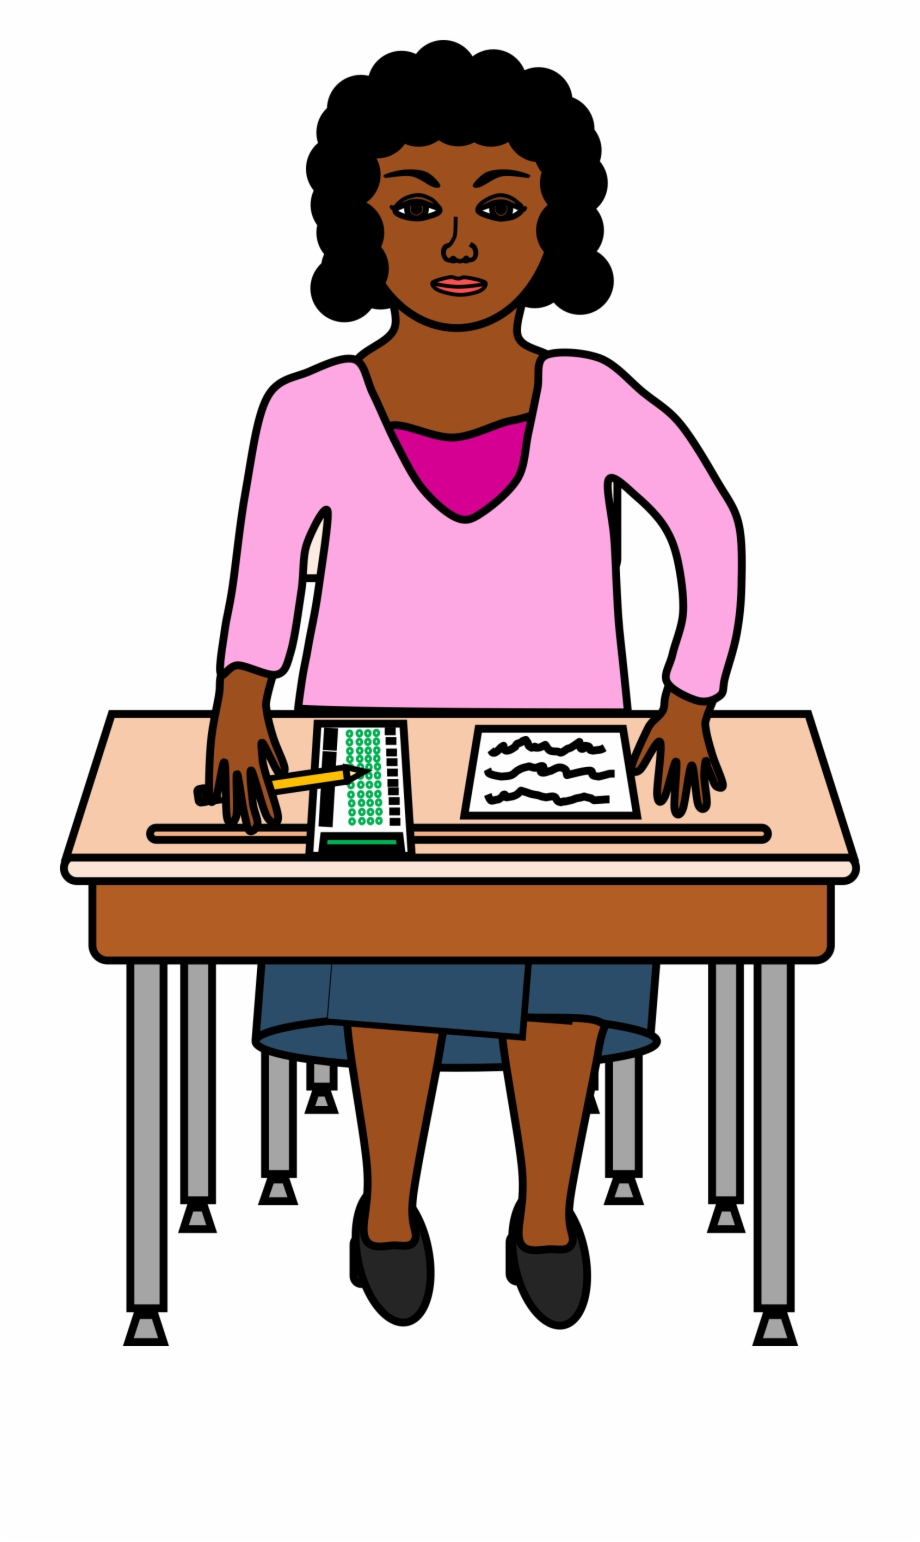 Clipart desk testing. Taking a standardized test